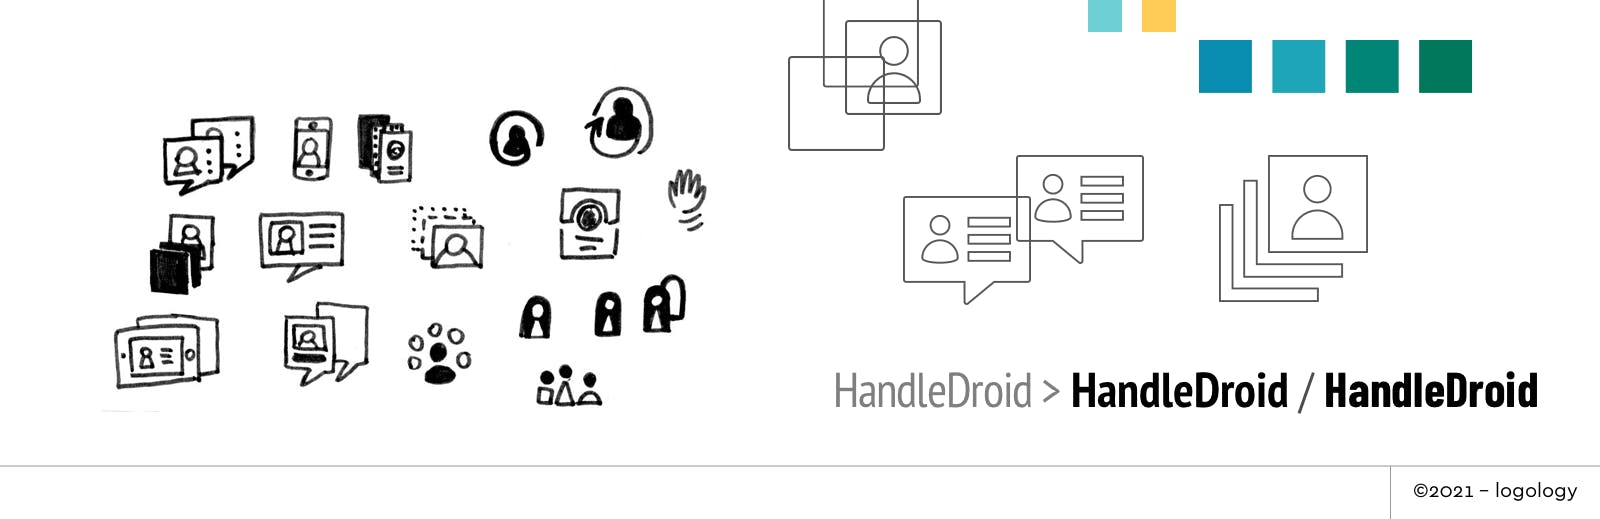 handle droid logo design sketches